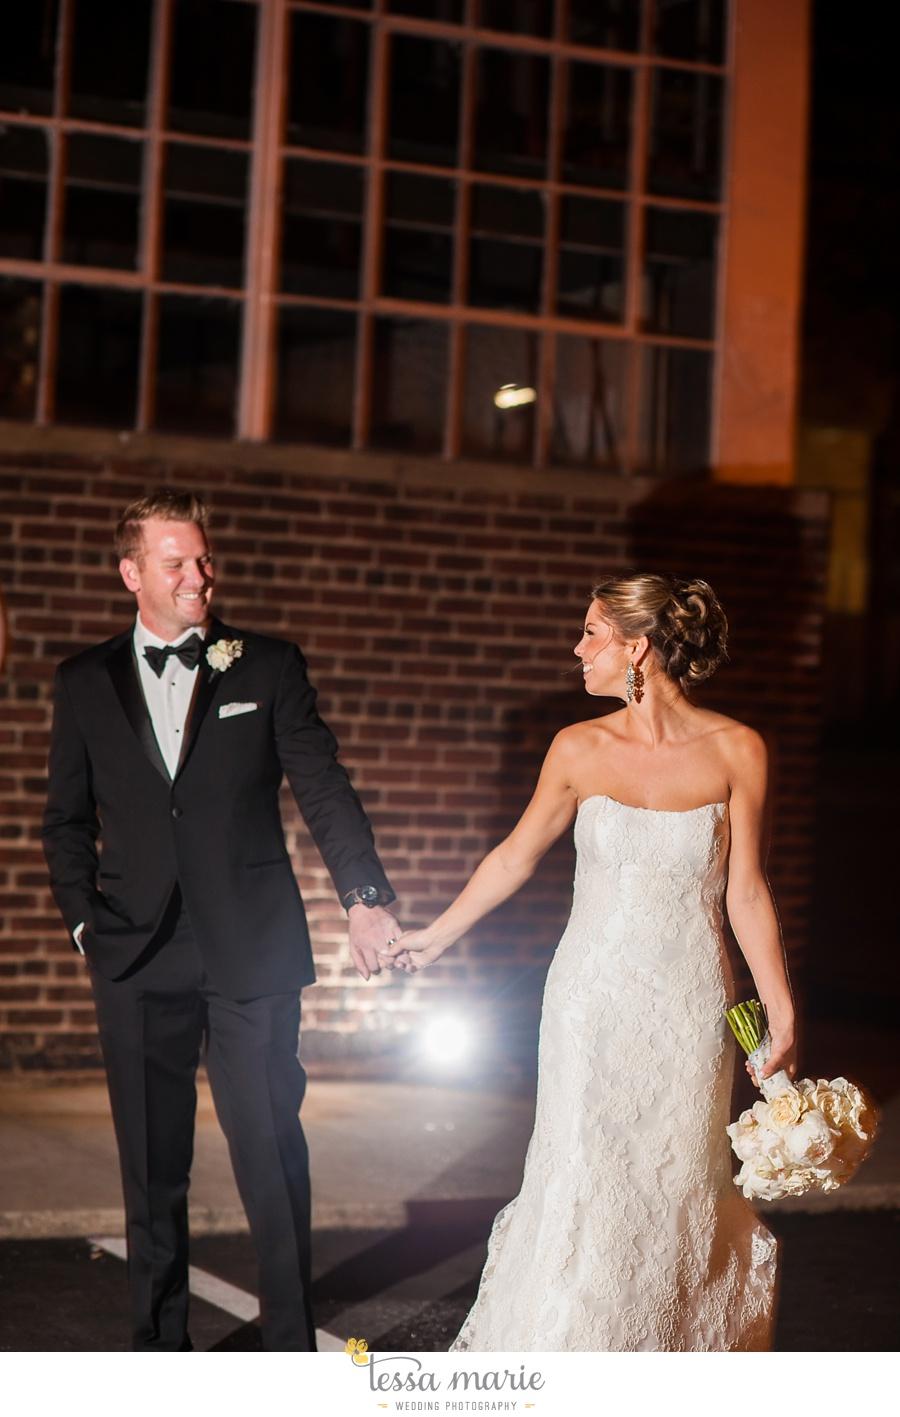 349_tessa_marie_weddings_emotional_moments_photography_king_low_wedding_sam_neil_best_atlanta_wedding_photographer